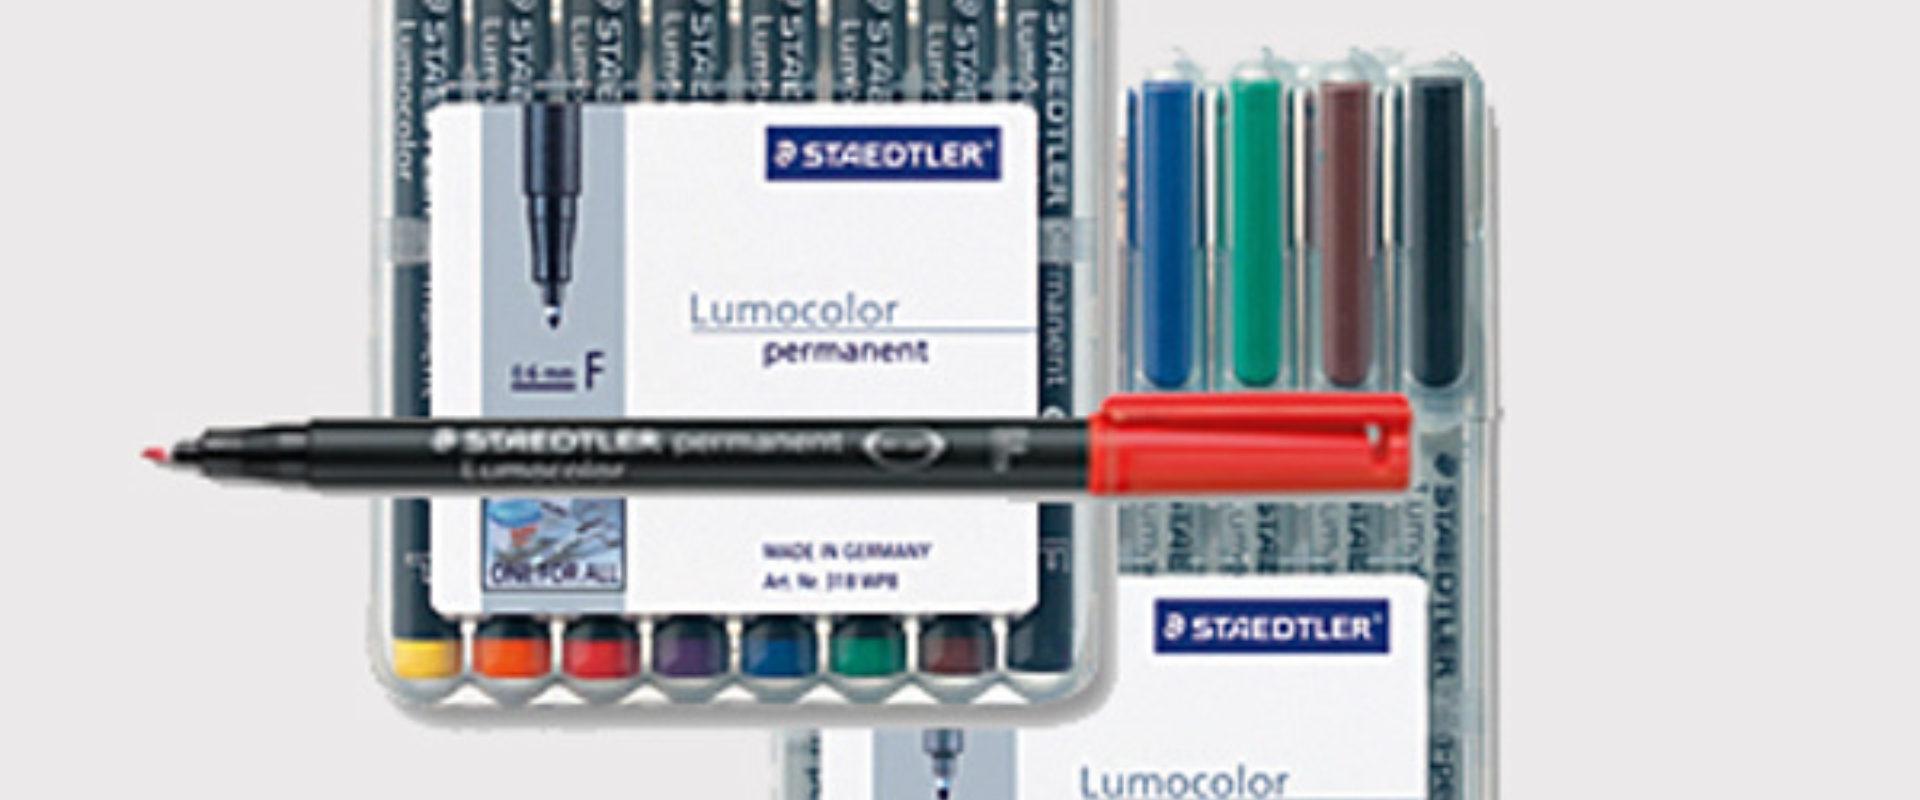 Staedler Finliner pemanent/non-permanent